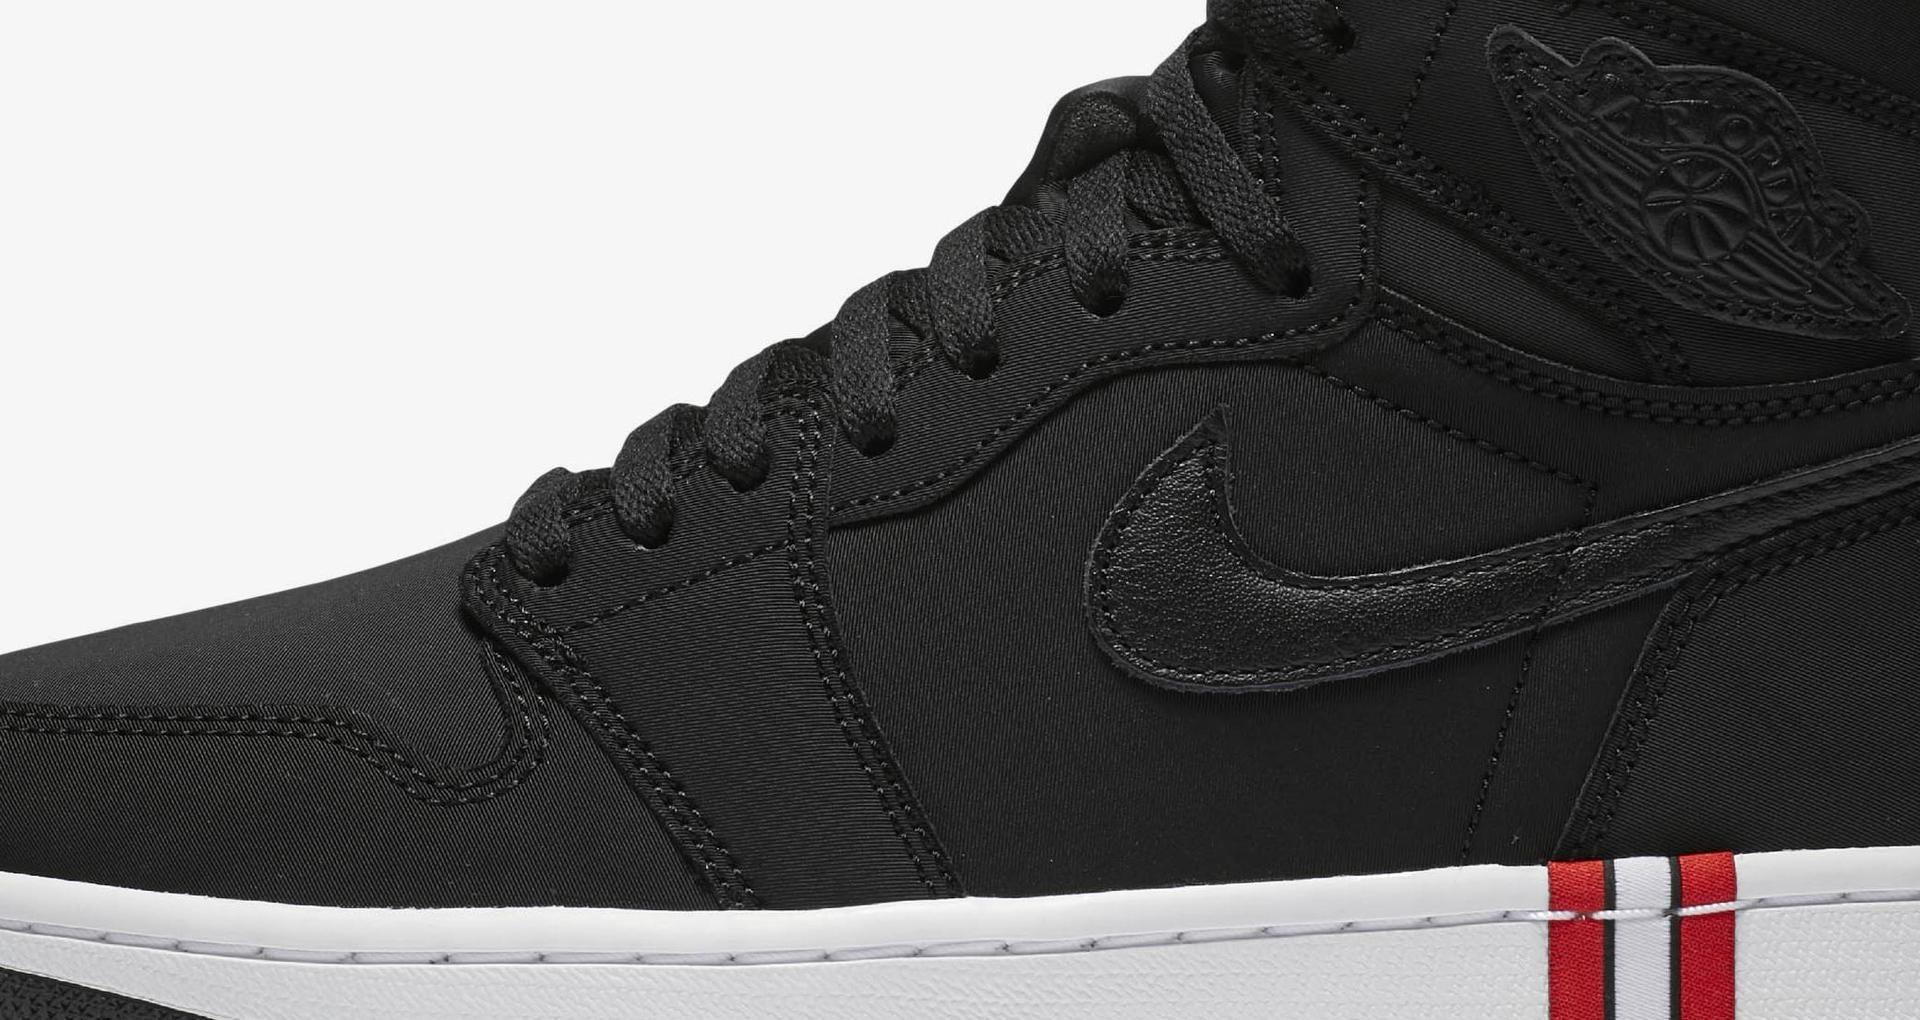 21ed52e6084c Air Jordan 1 PSG  Black   Challenge Red  Release Date. Nike+ SNKRS